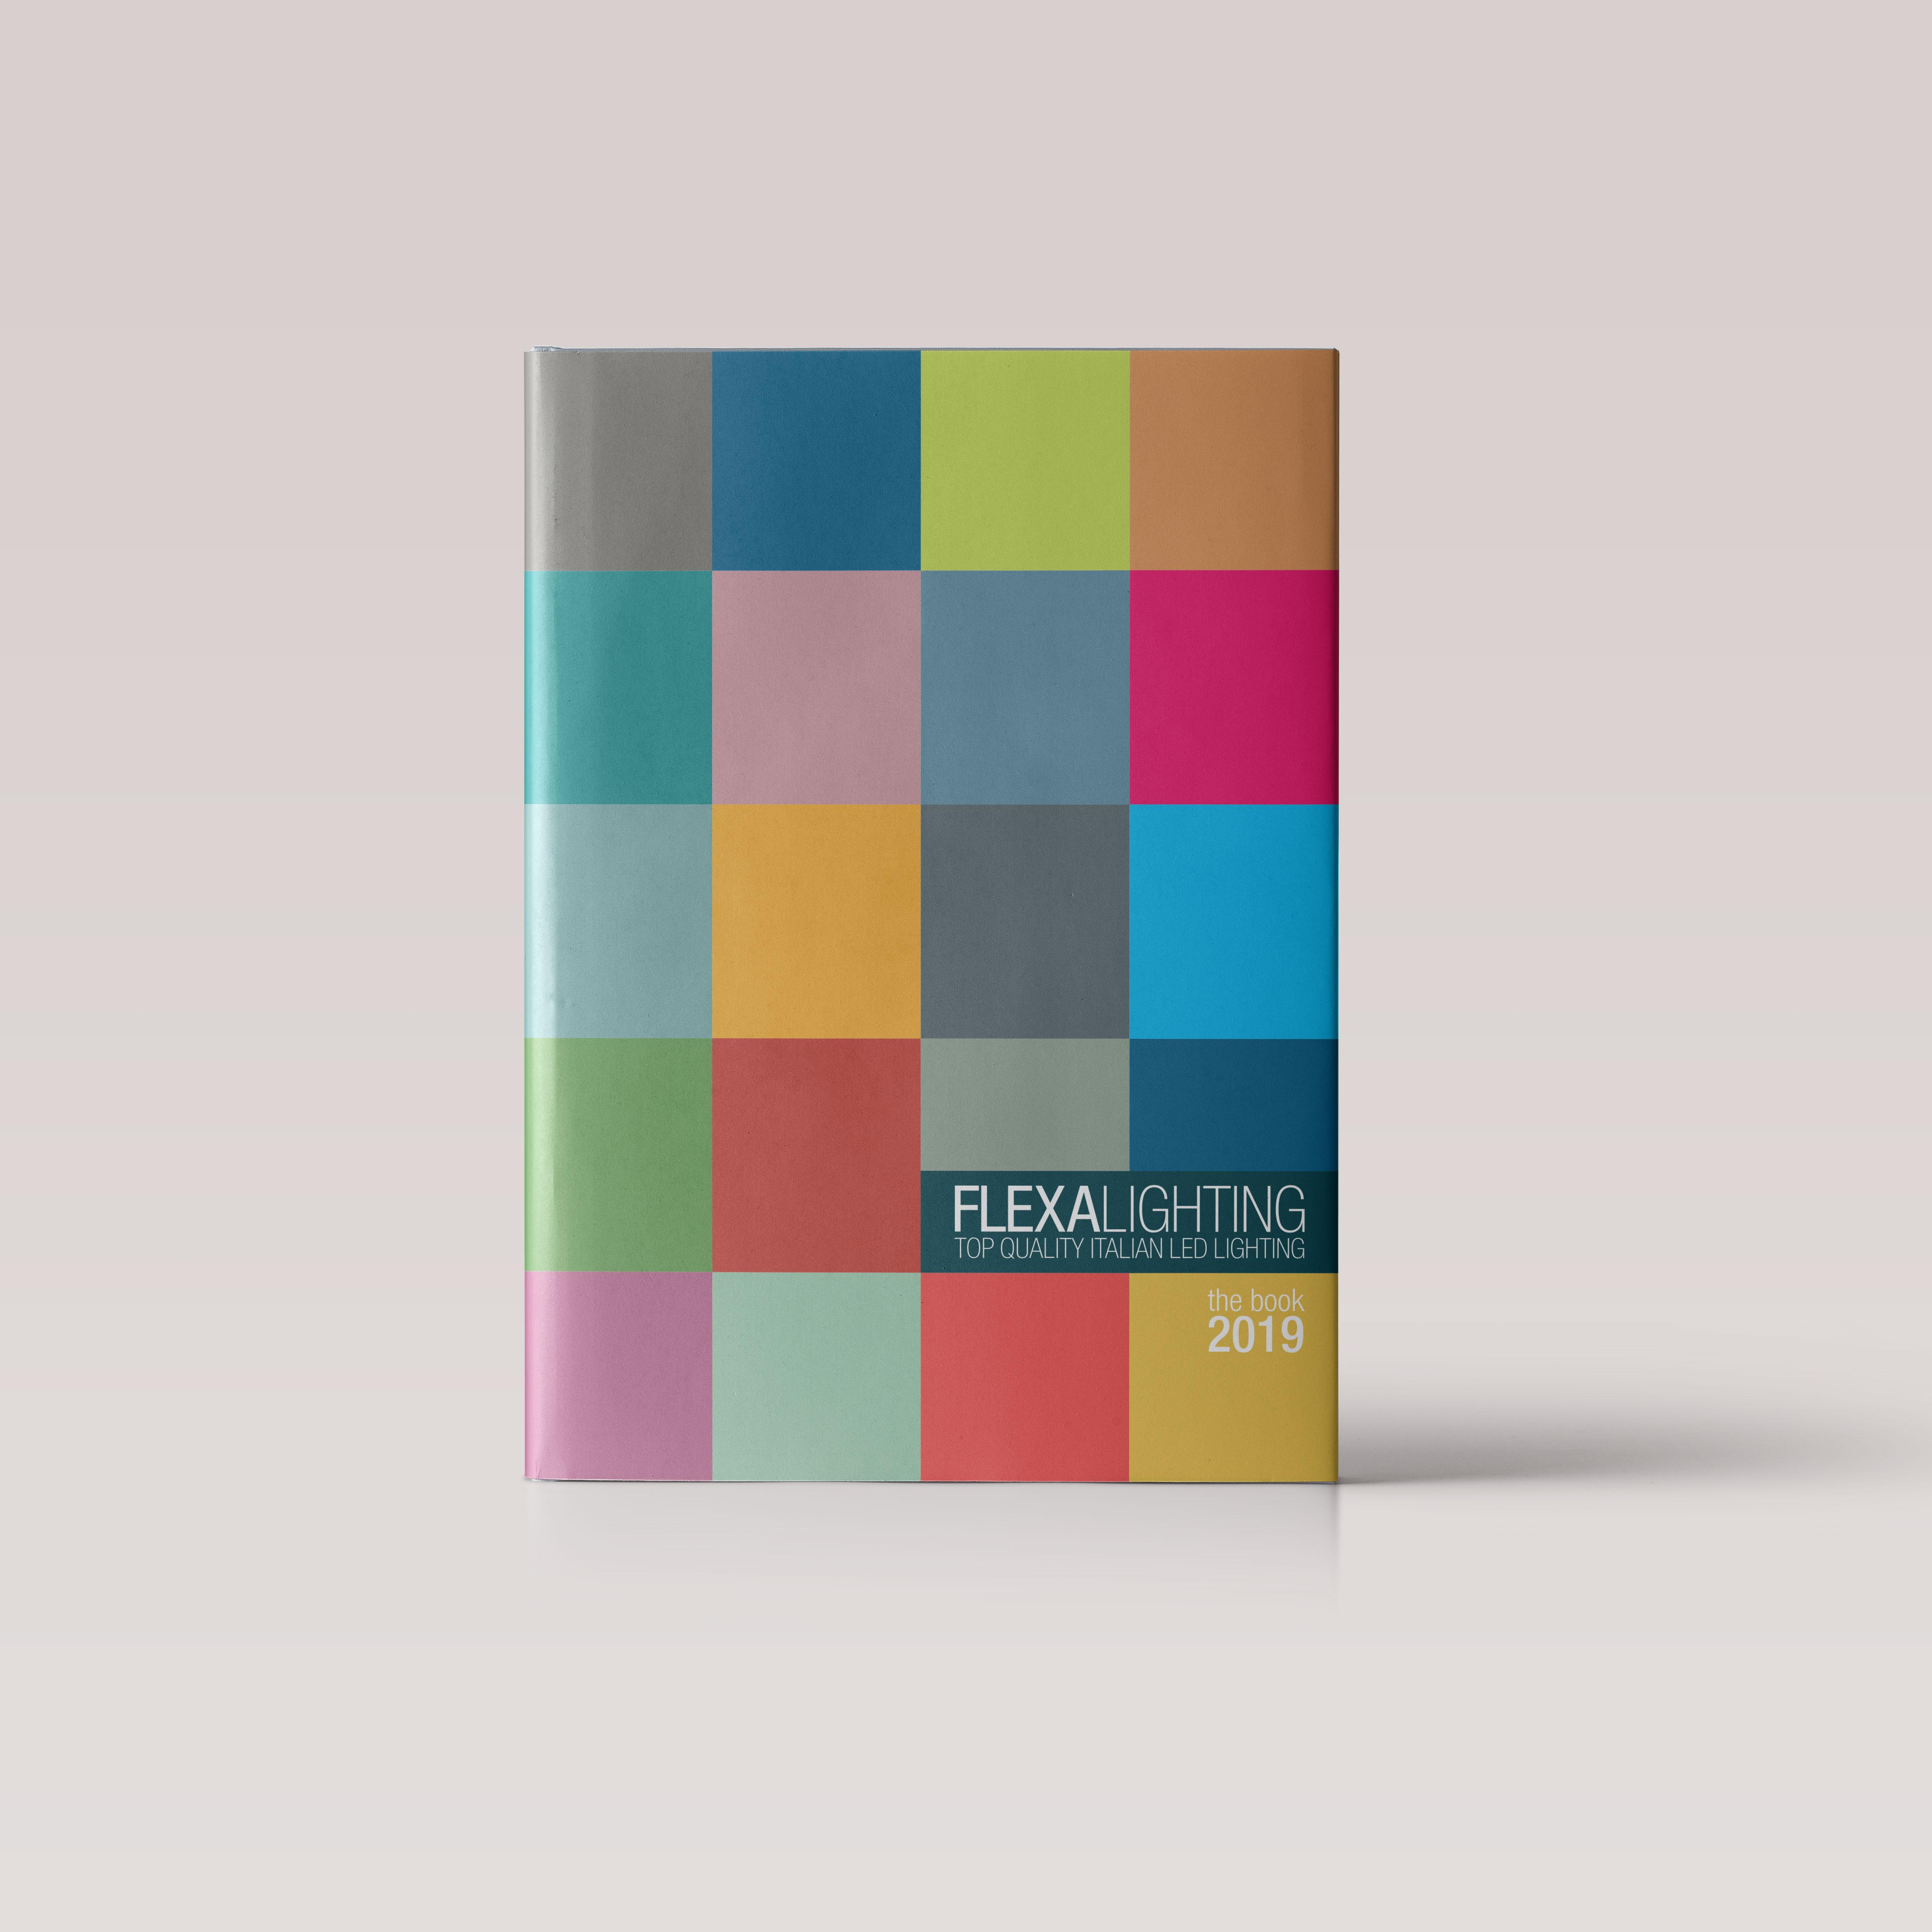 Catálogo Flexalighting Book 2019